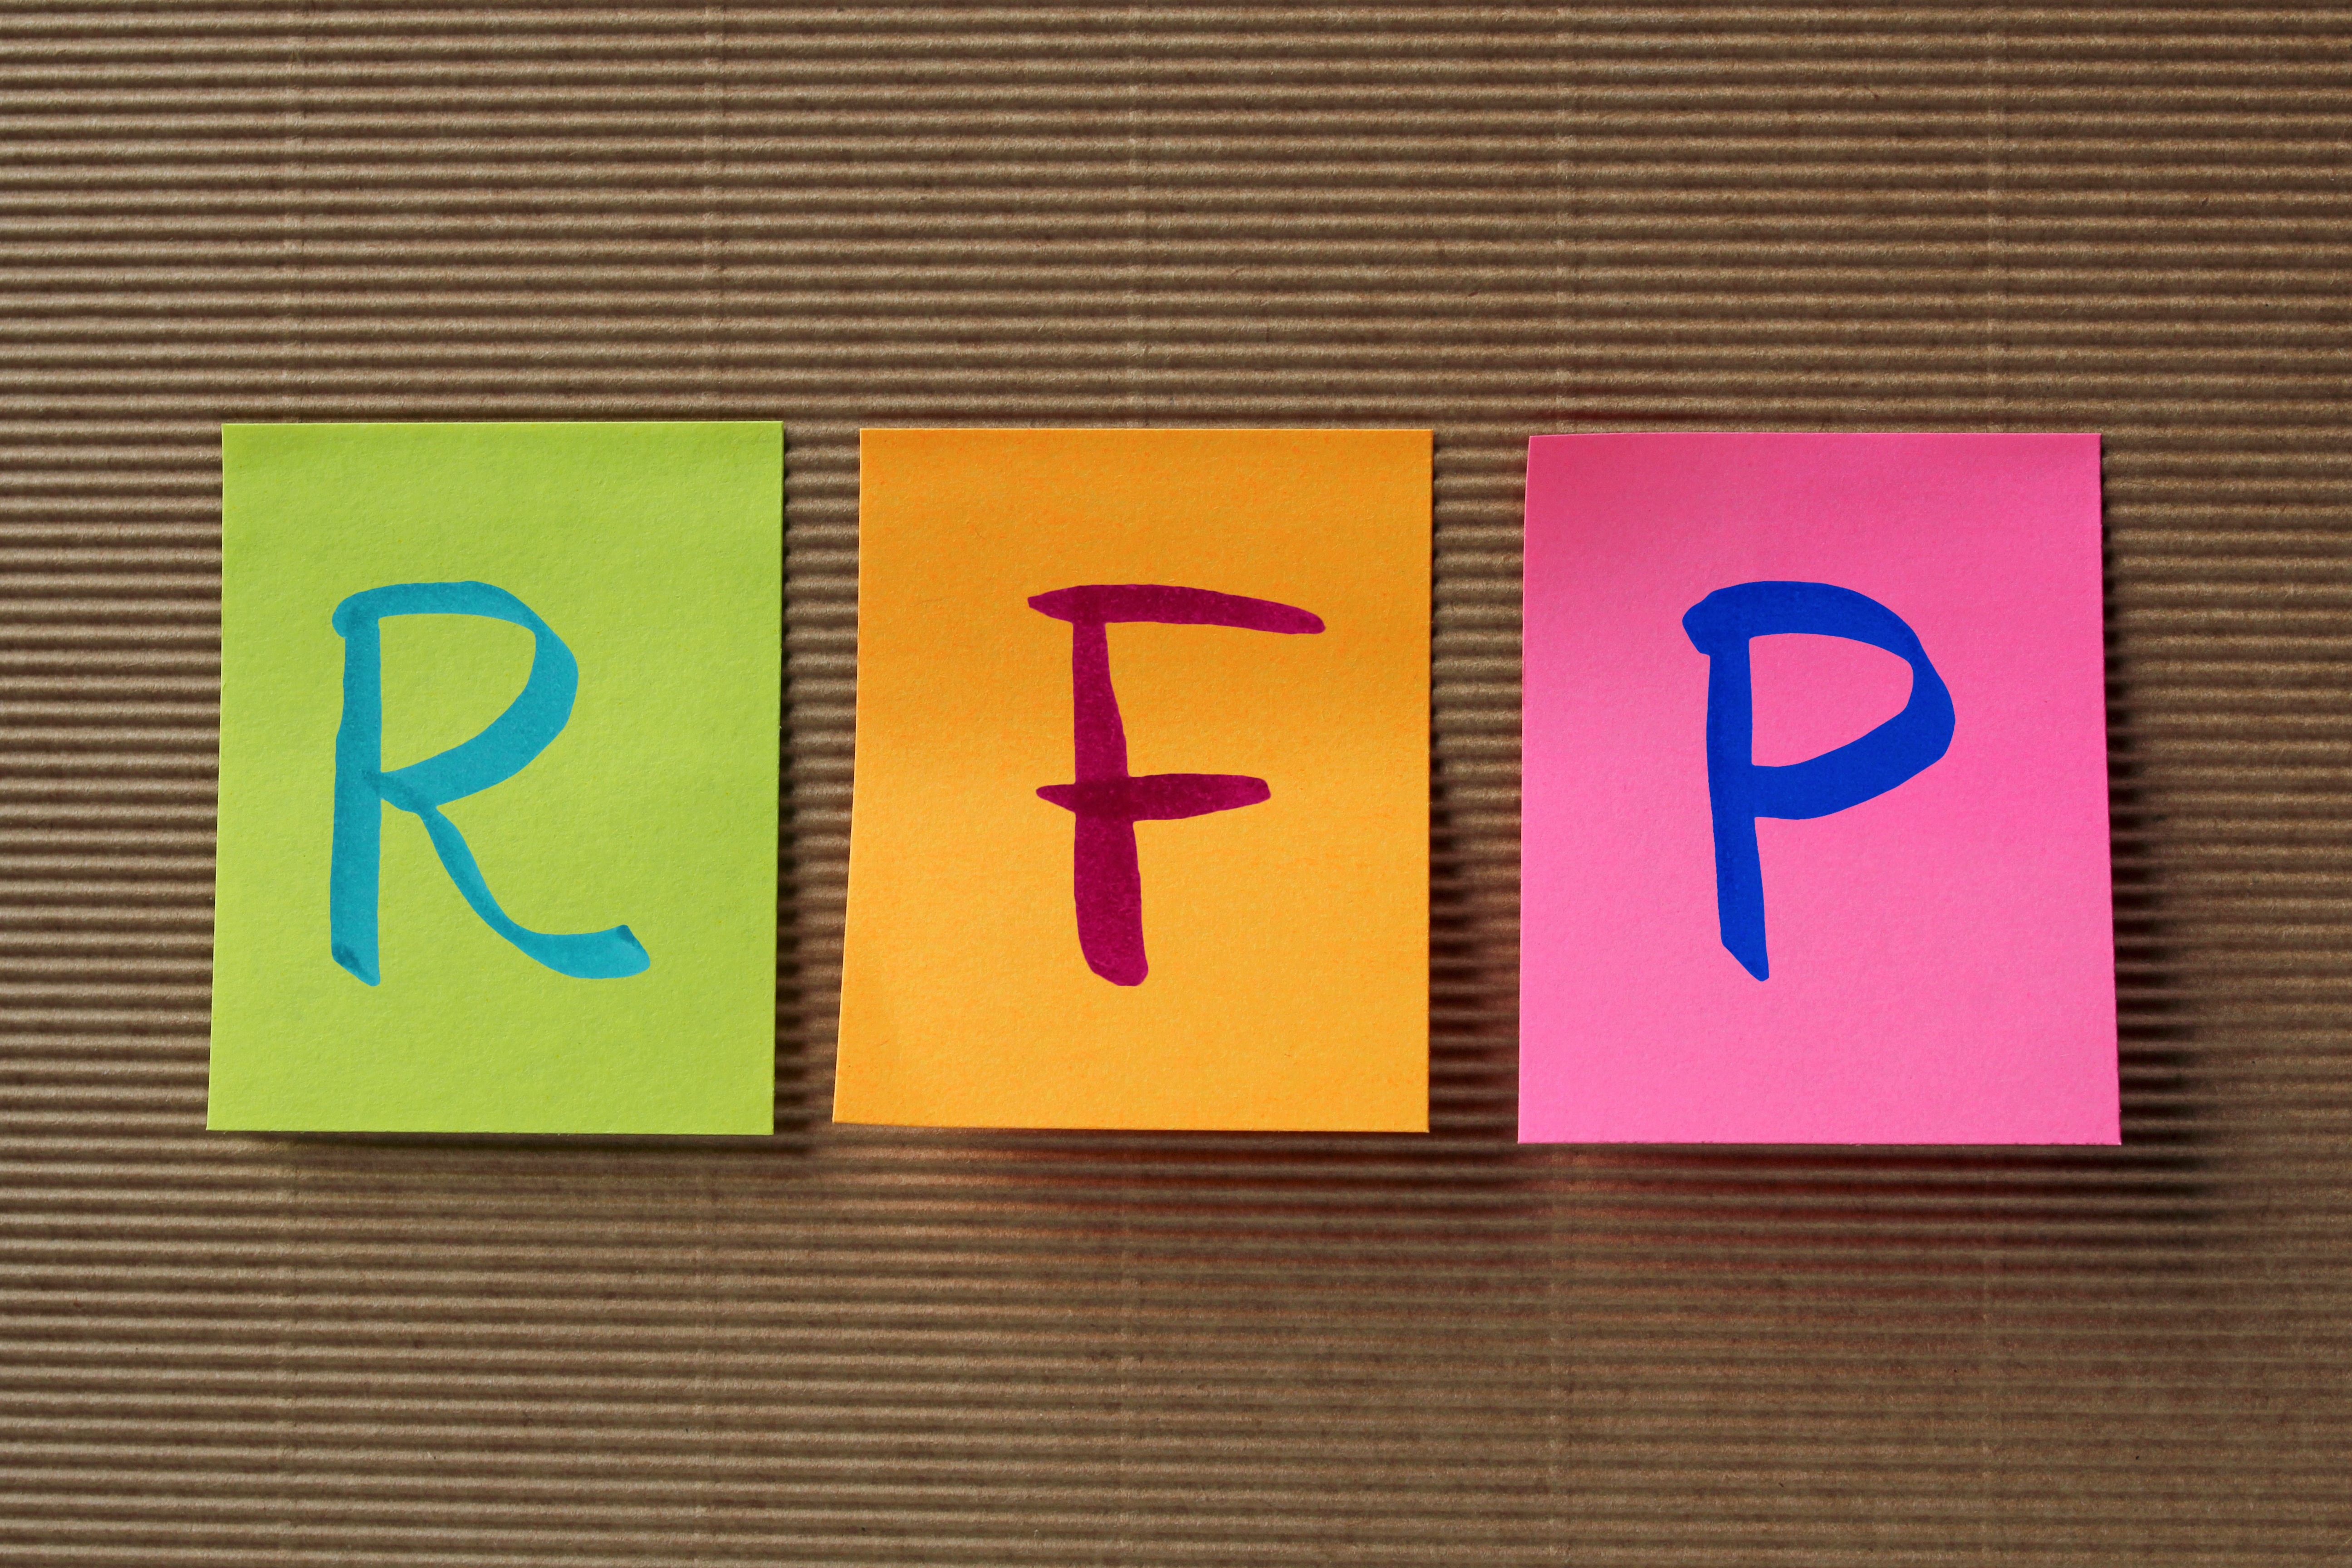 design-build-rfp.jpg